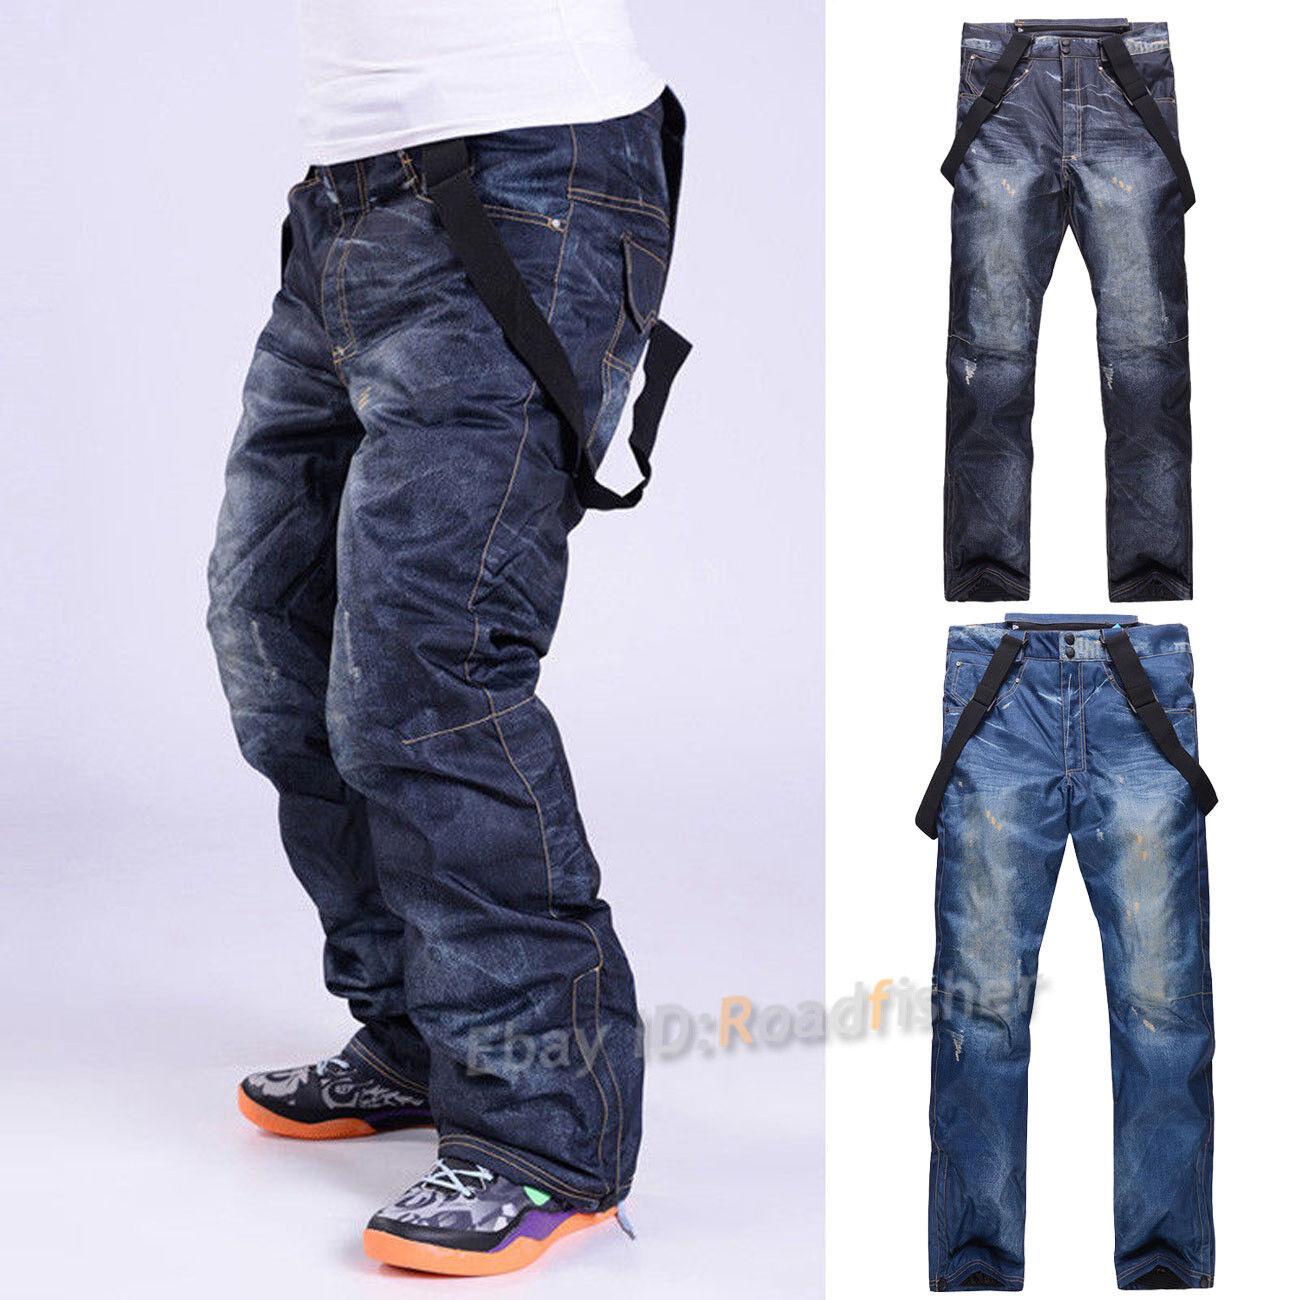 Winter Men Denim Waterproof Ski Pants Outdoor Snowboard Windproof Trousers Pants